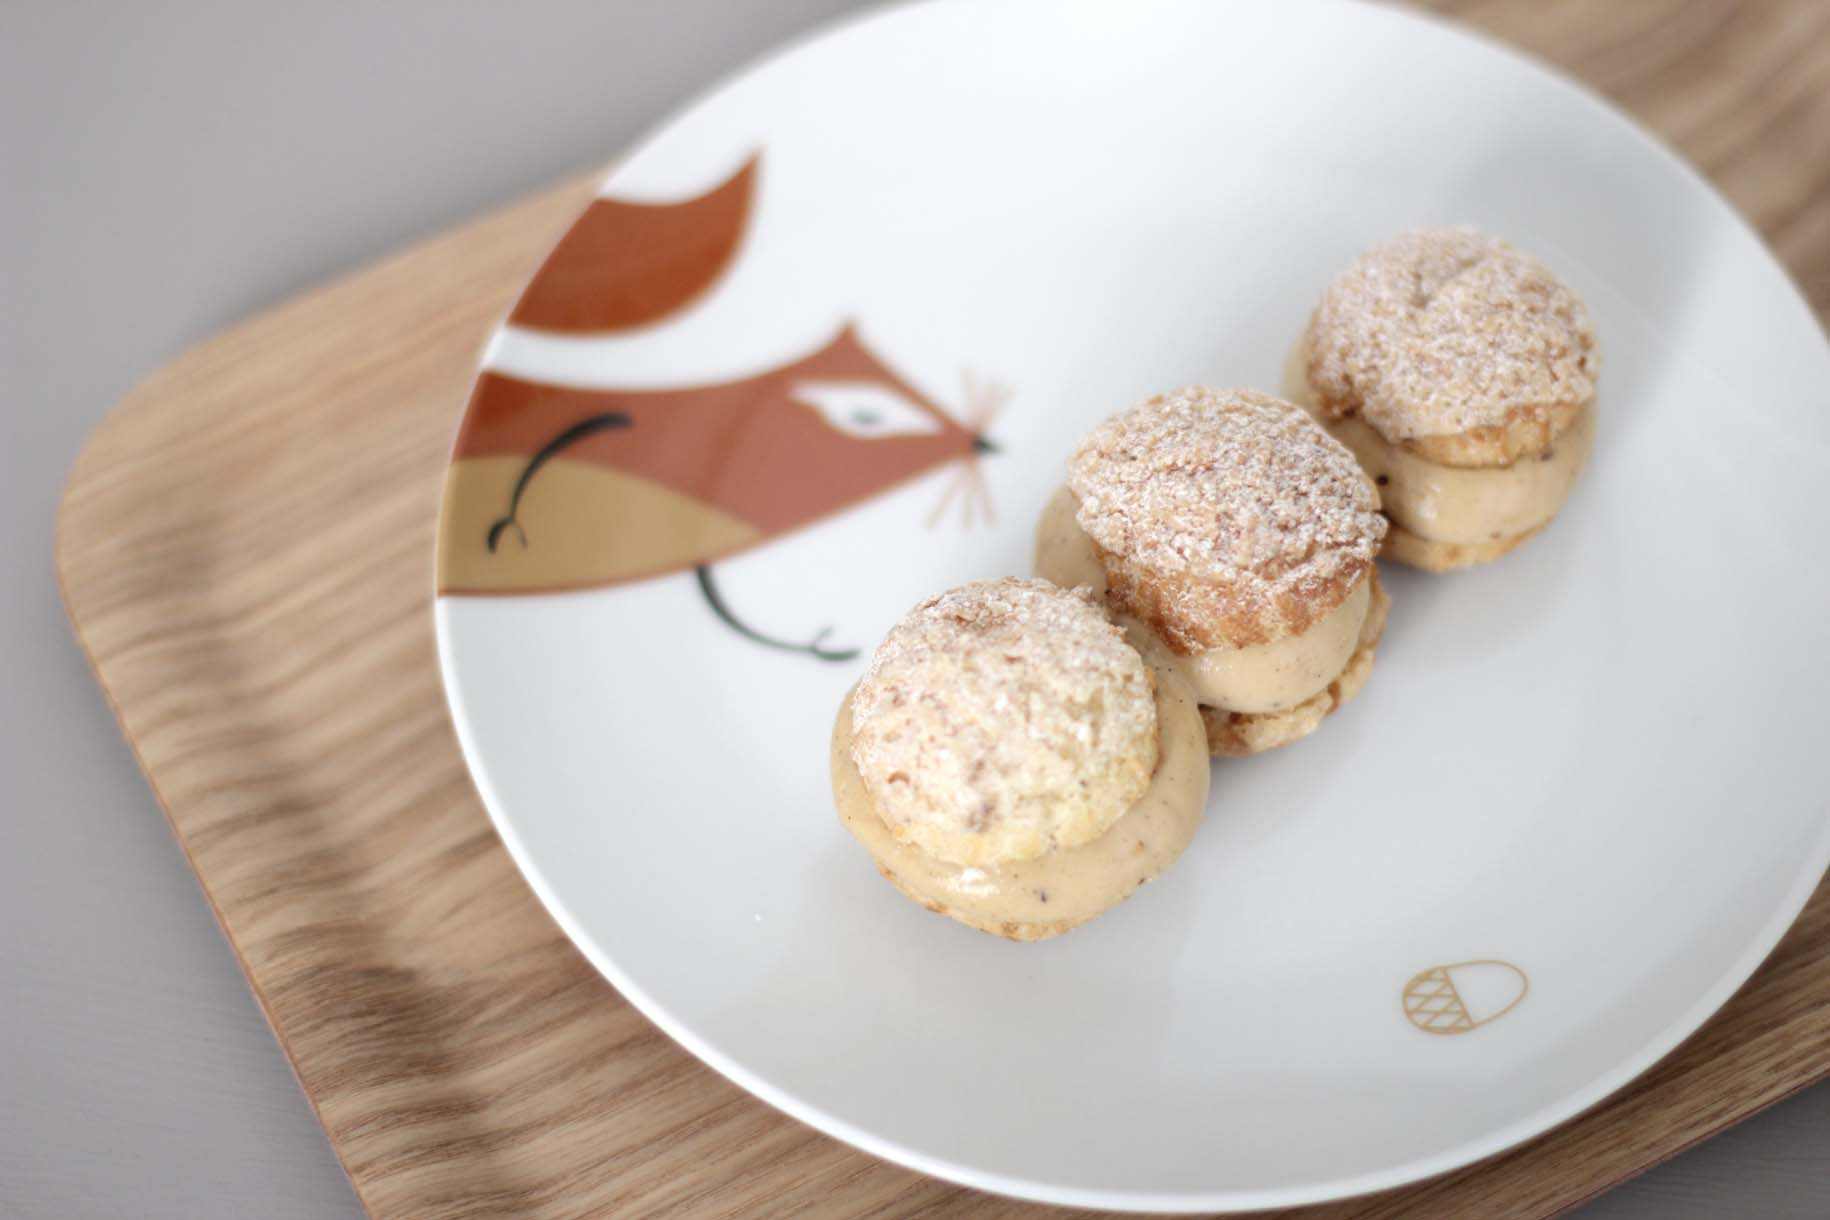 La p tisserie cyril lignac esperluette for Atelier cuisine cyril lignac